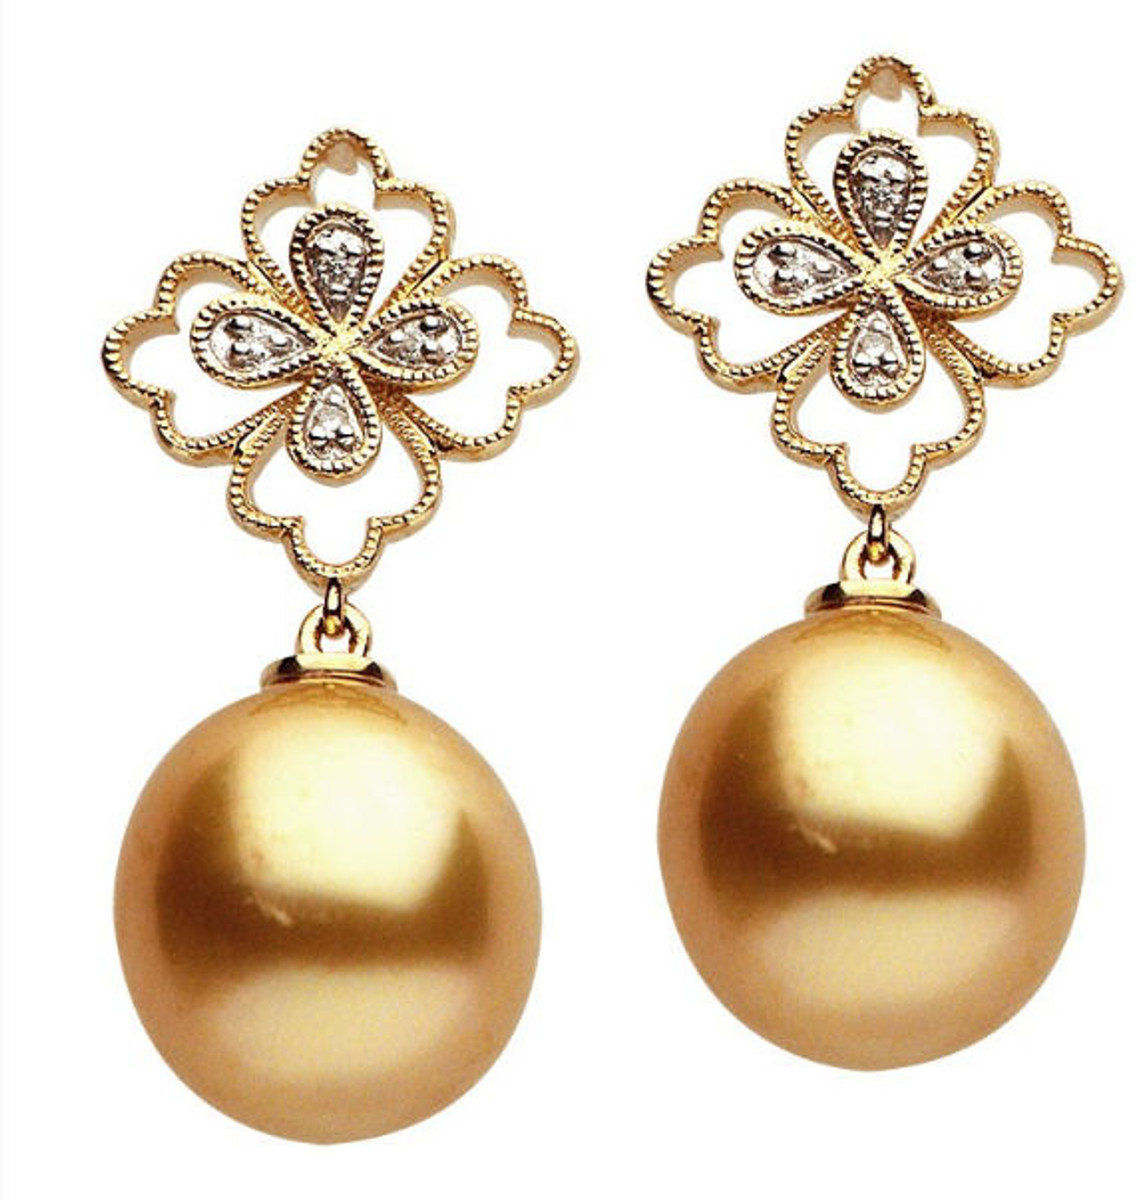 Diamond & Golden South Sea Cultured Pearl Earrings